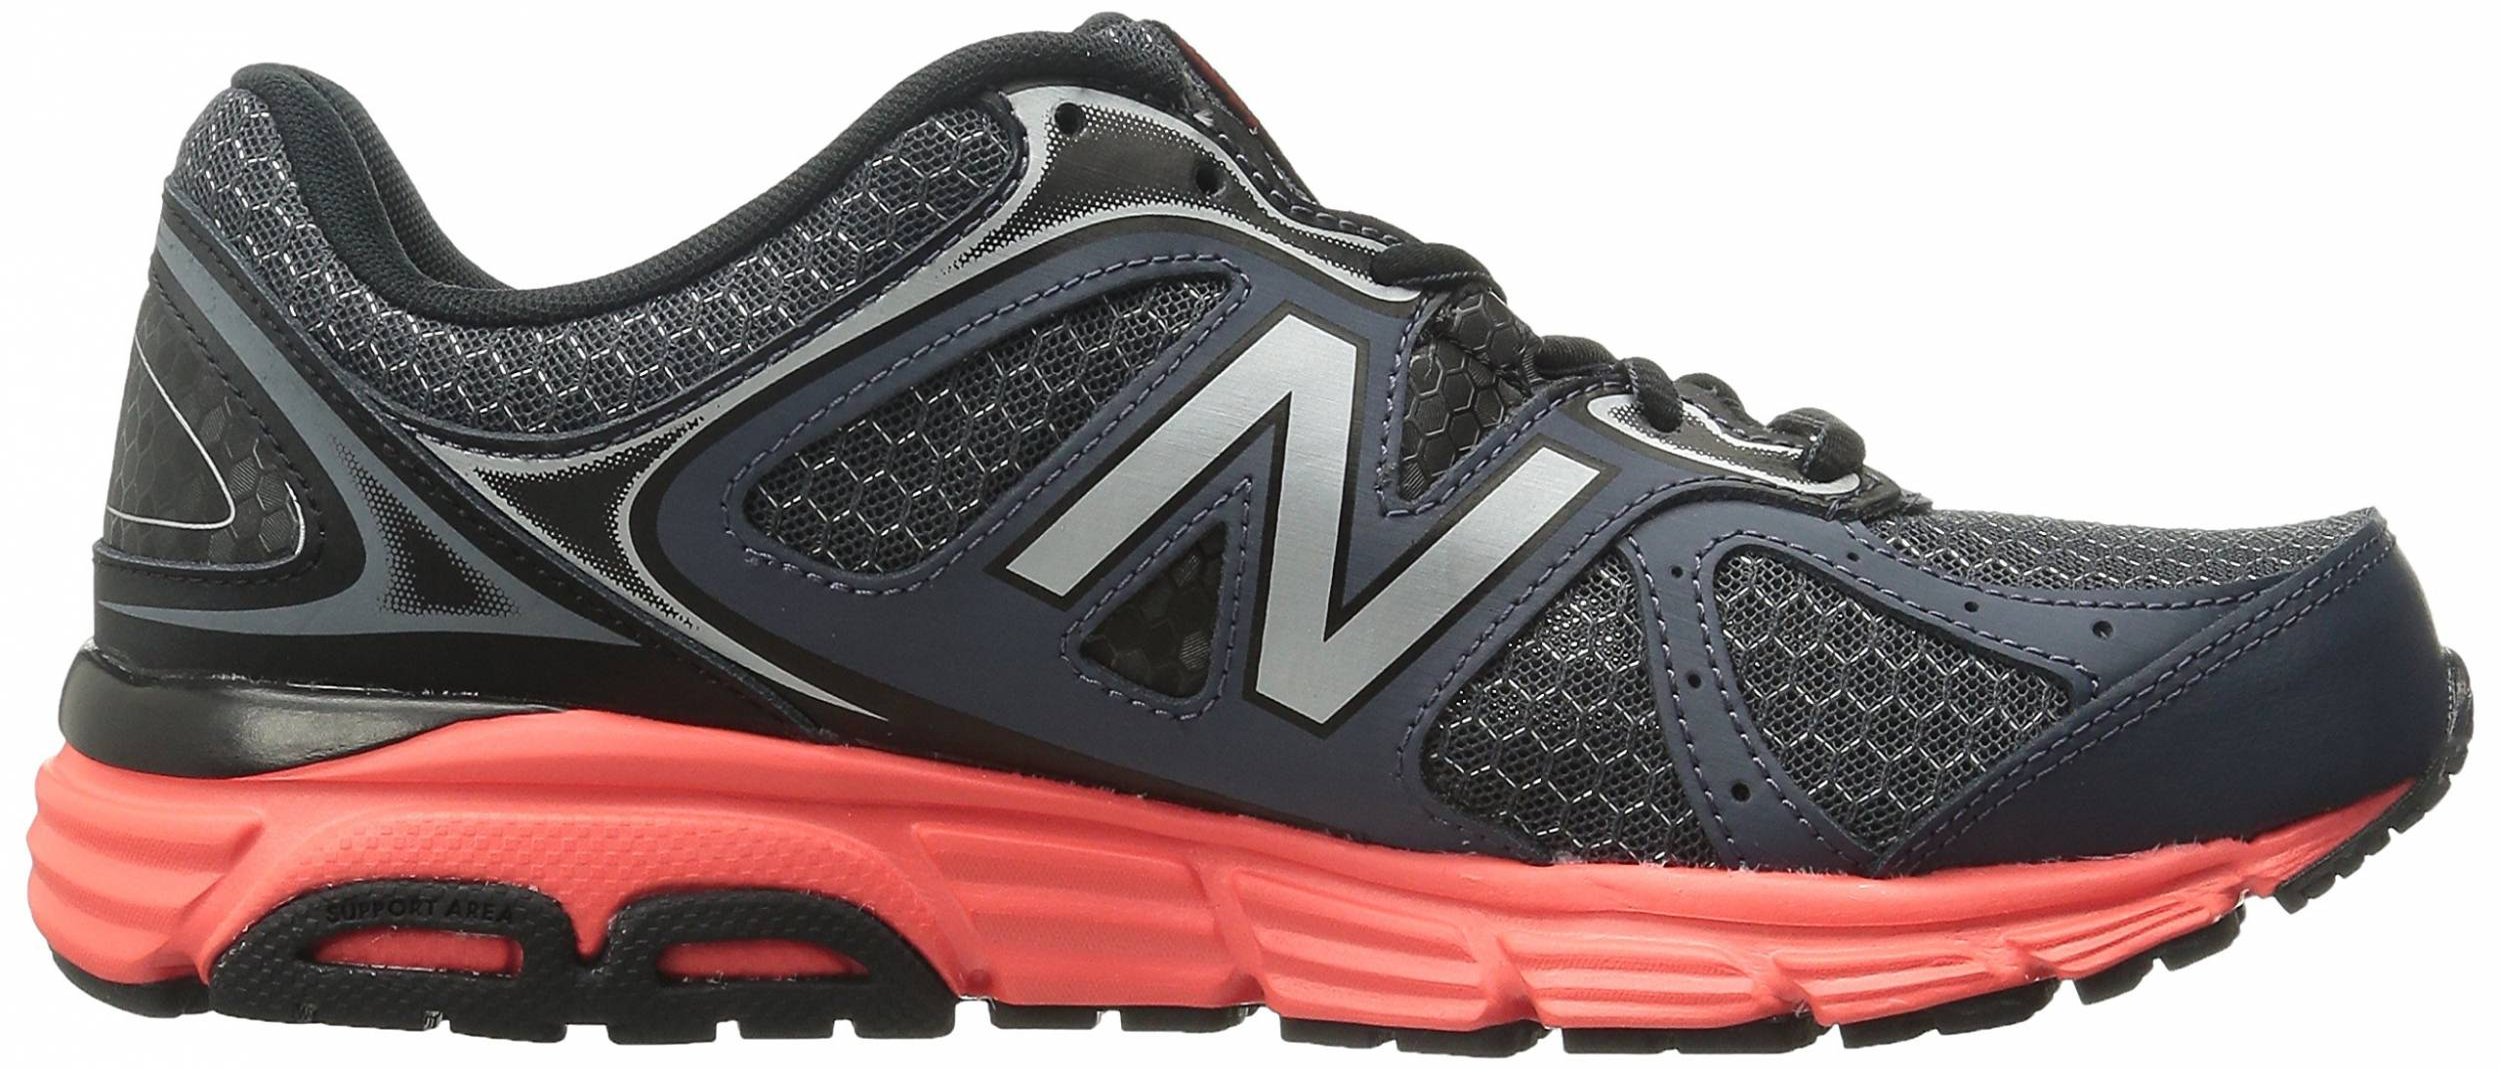 New Balance 560 v6